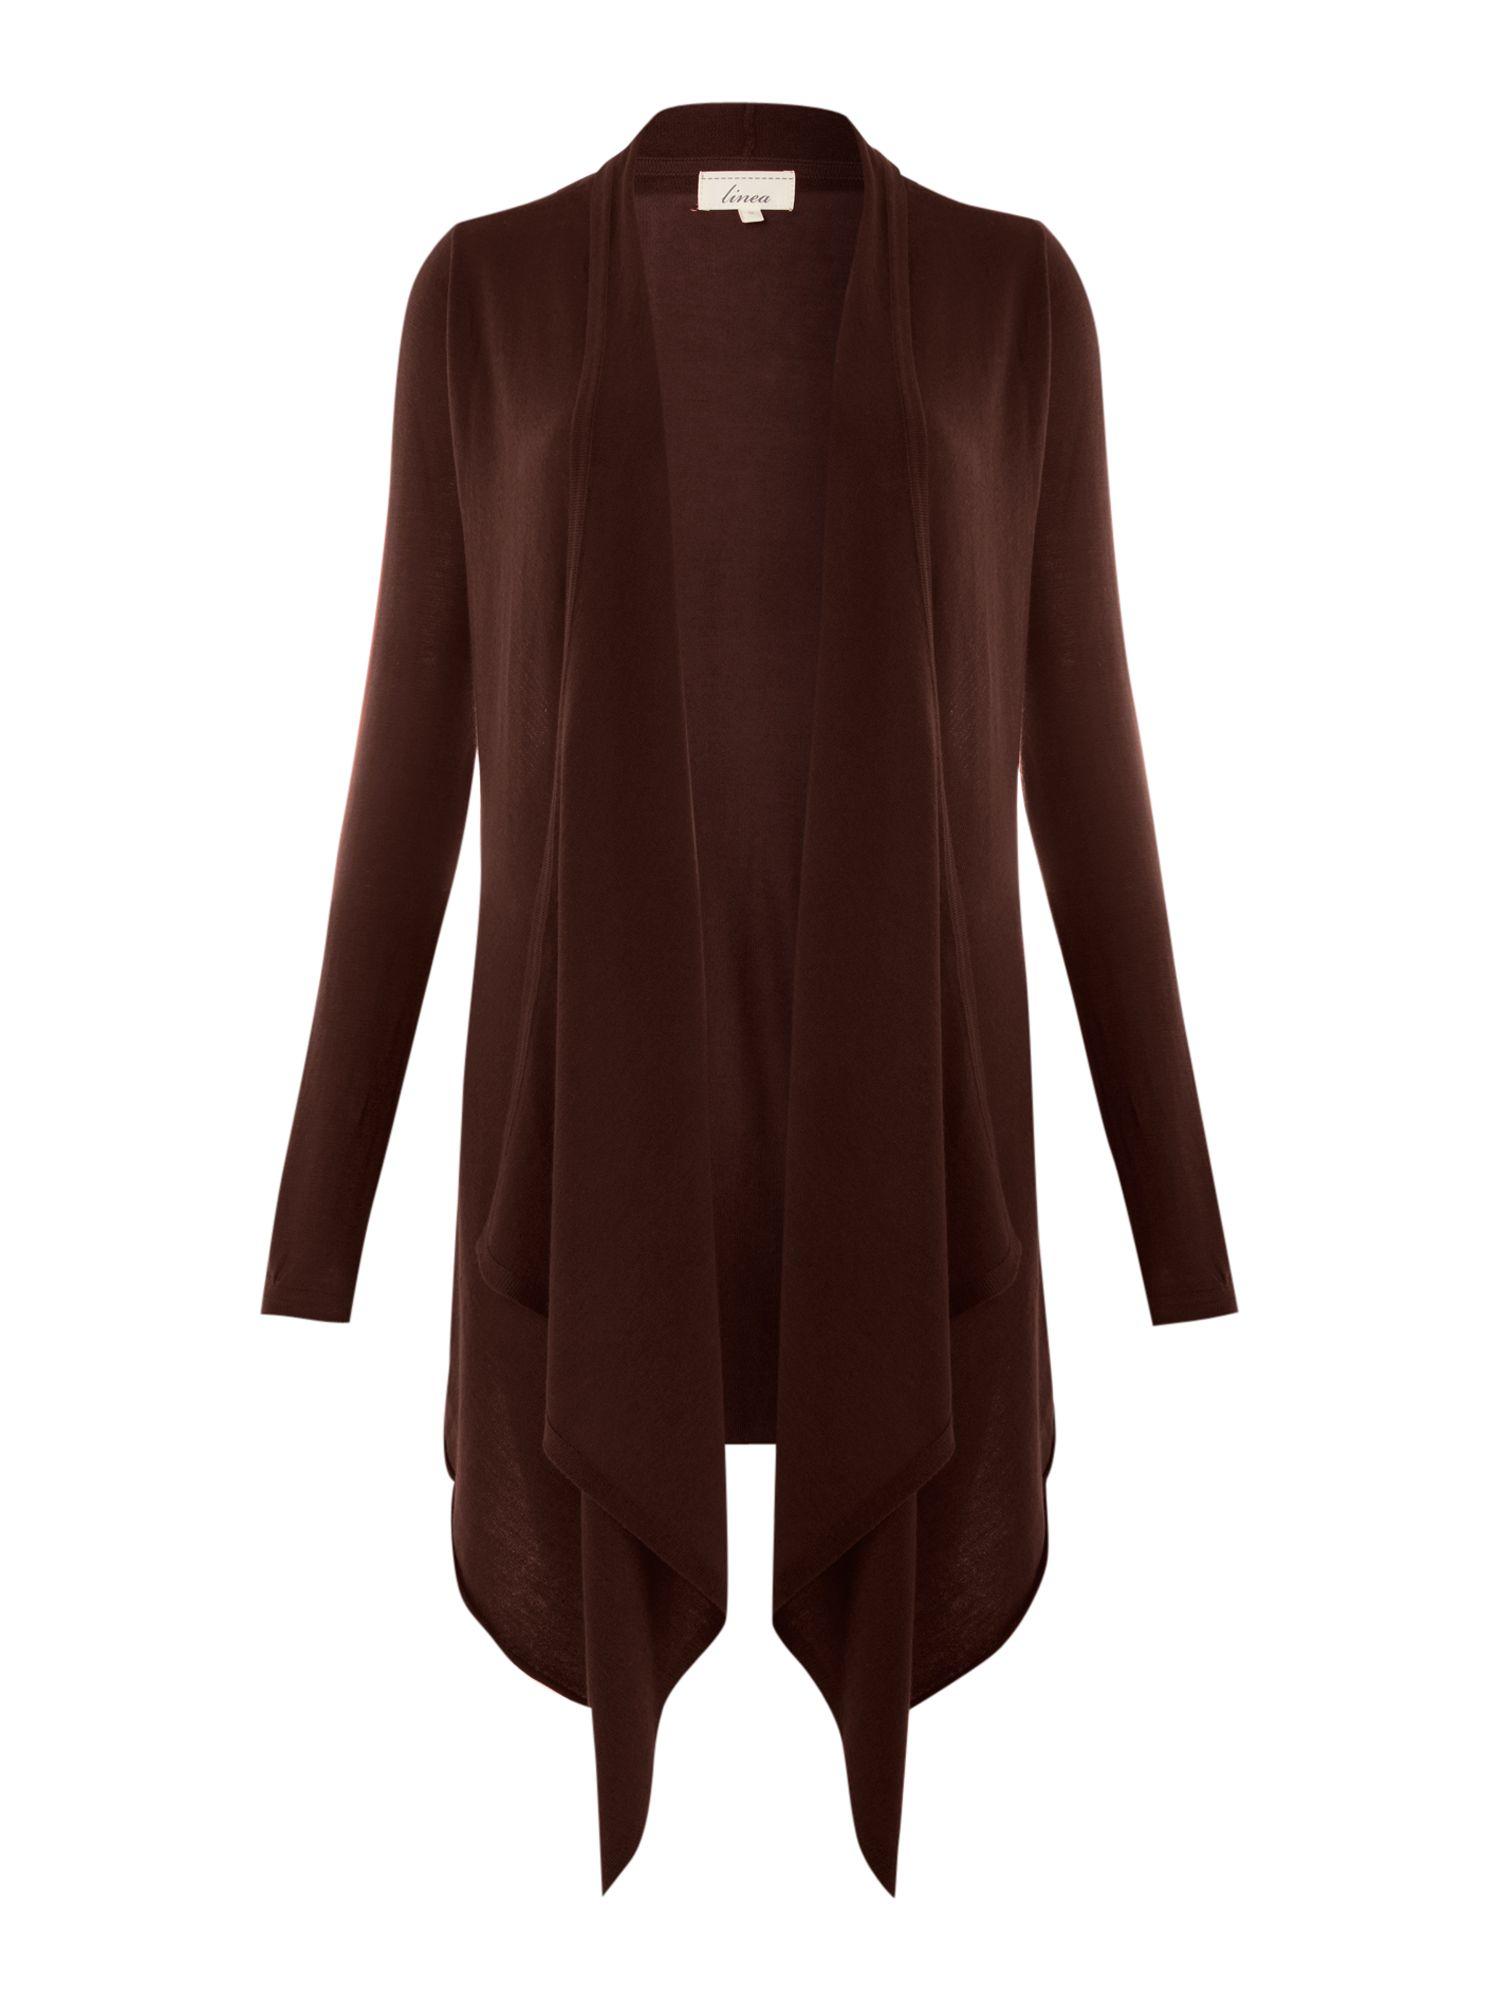 Linea Waterfall Cardigan In Brown Chocolate Lyst